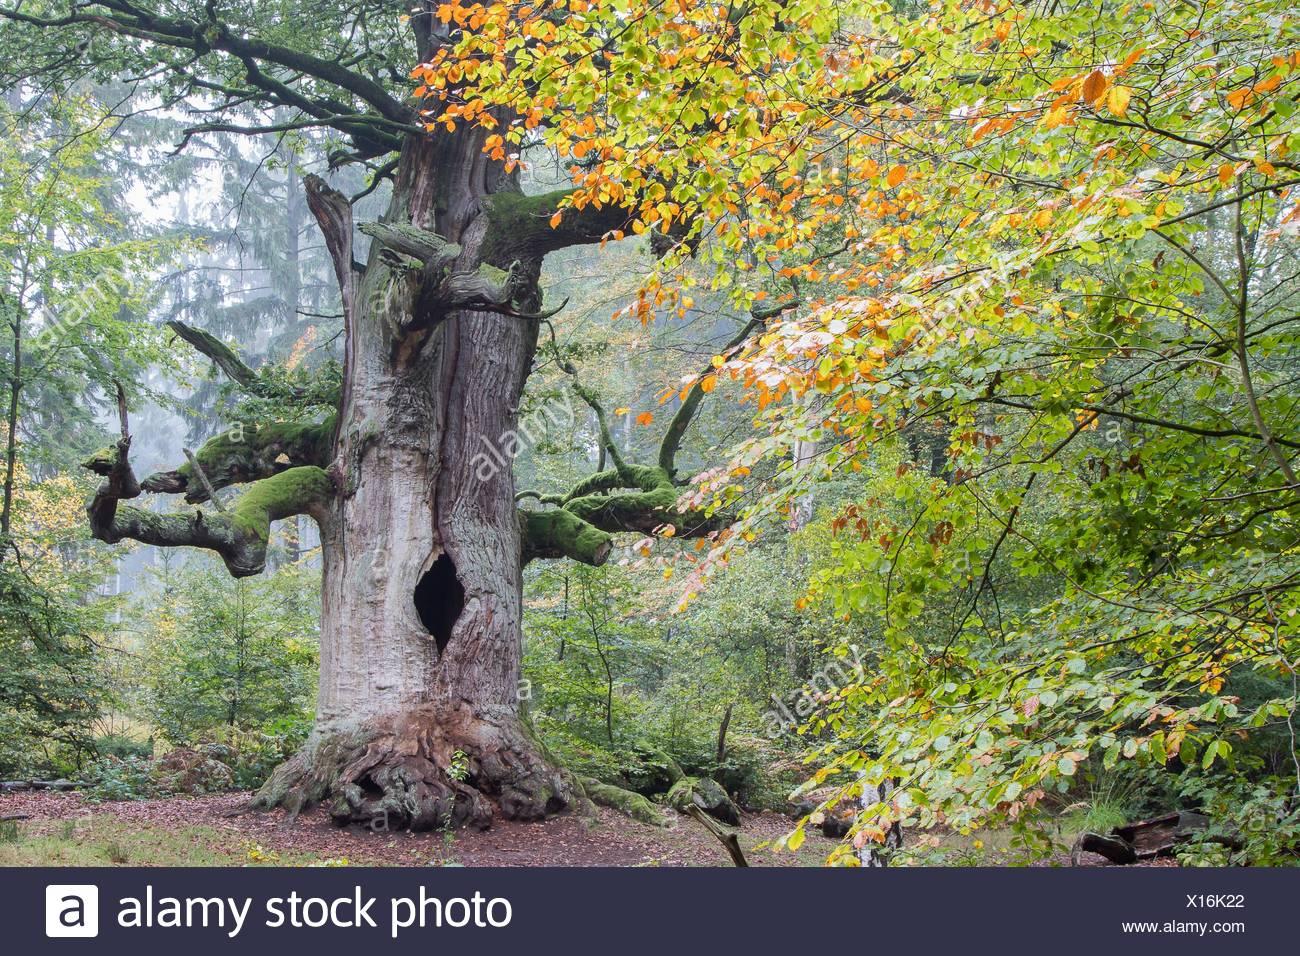 English oak (Quercus robur) in Urwald Sababurg, autumn, Hesse, Germany - Stock Image